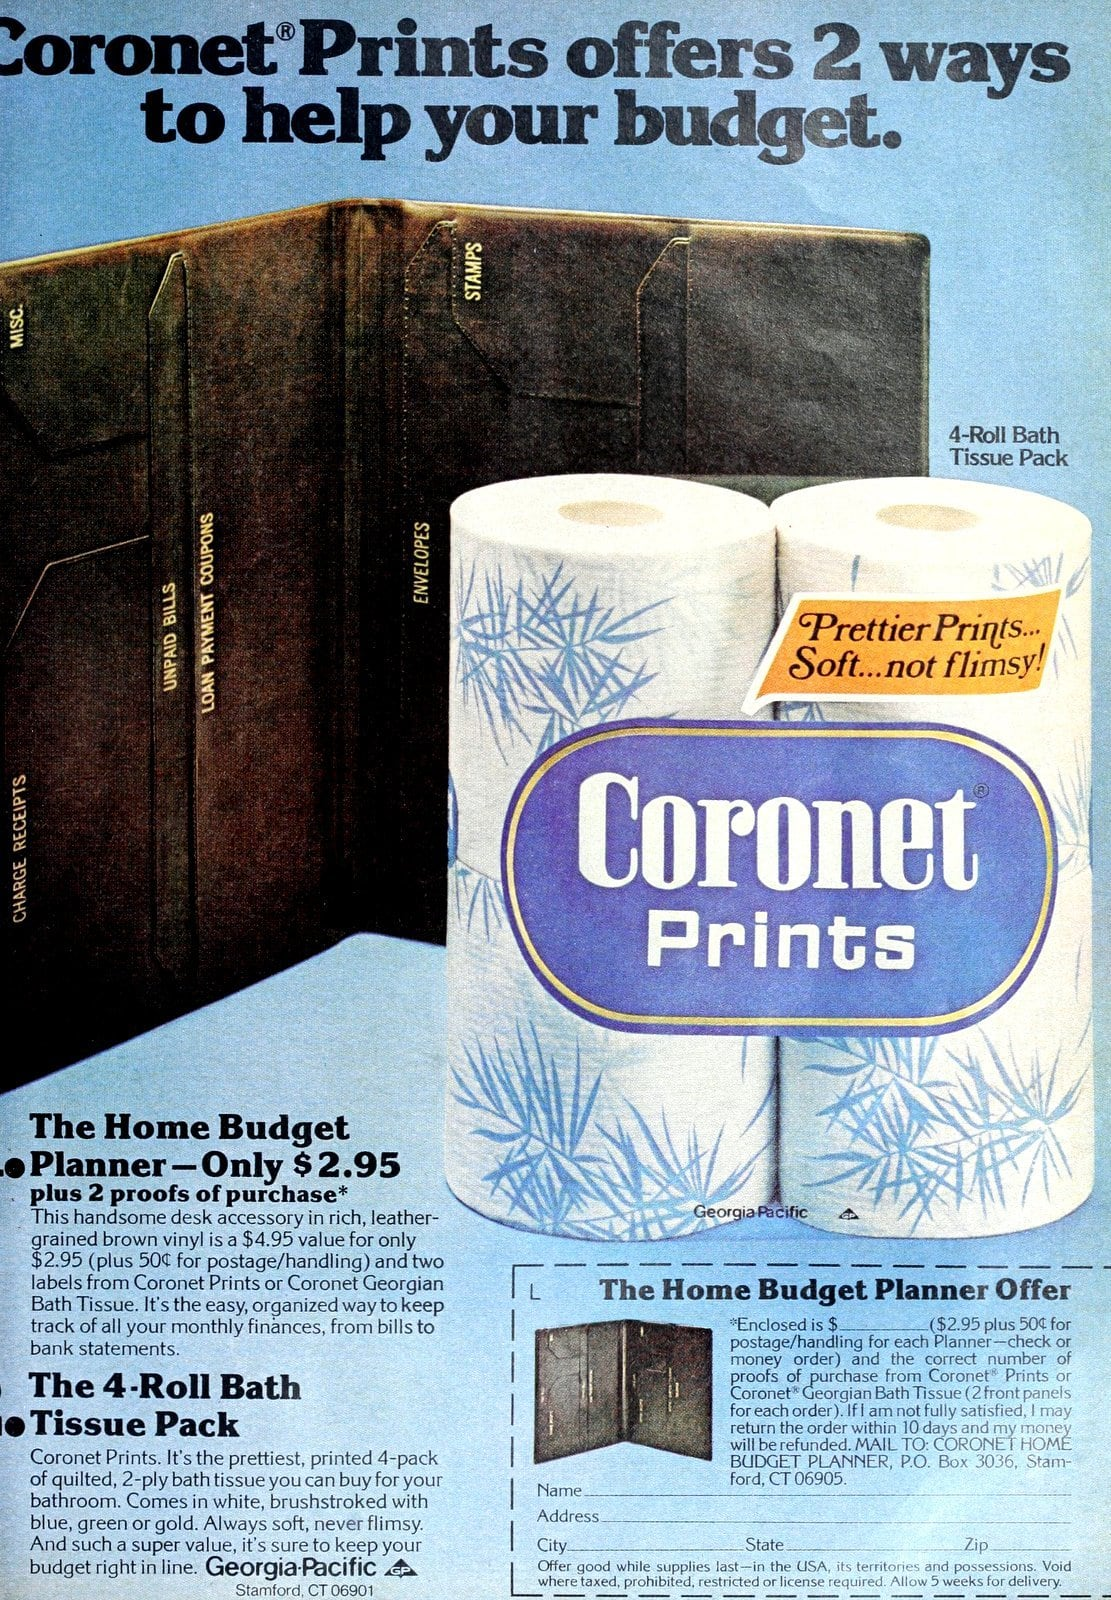 Coronet toilet paper budget planner offer (1977)